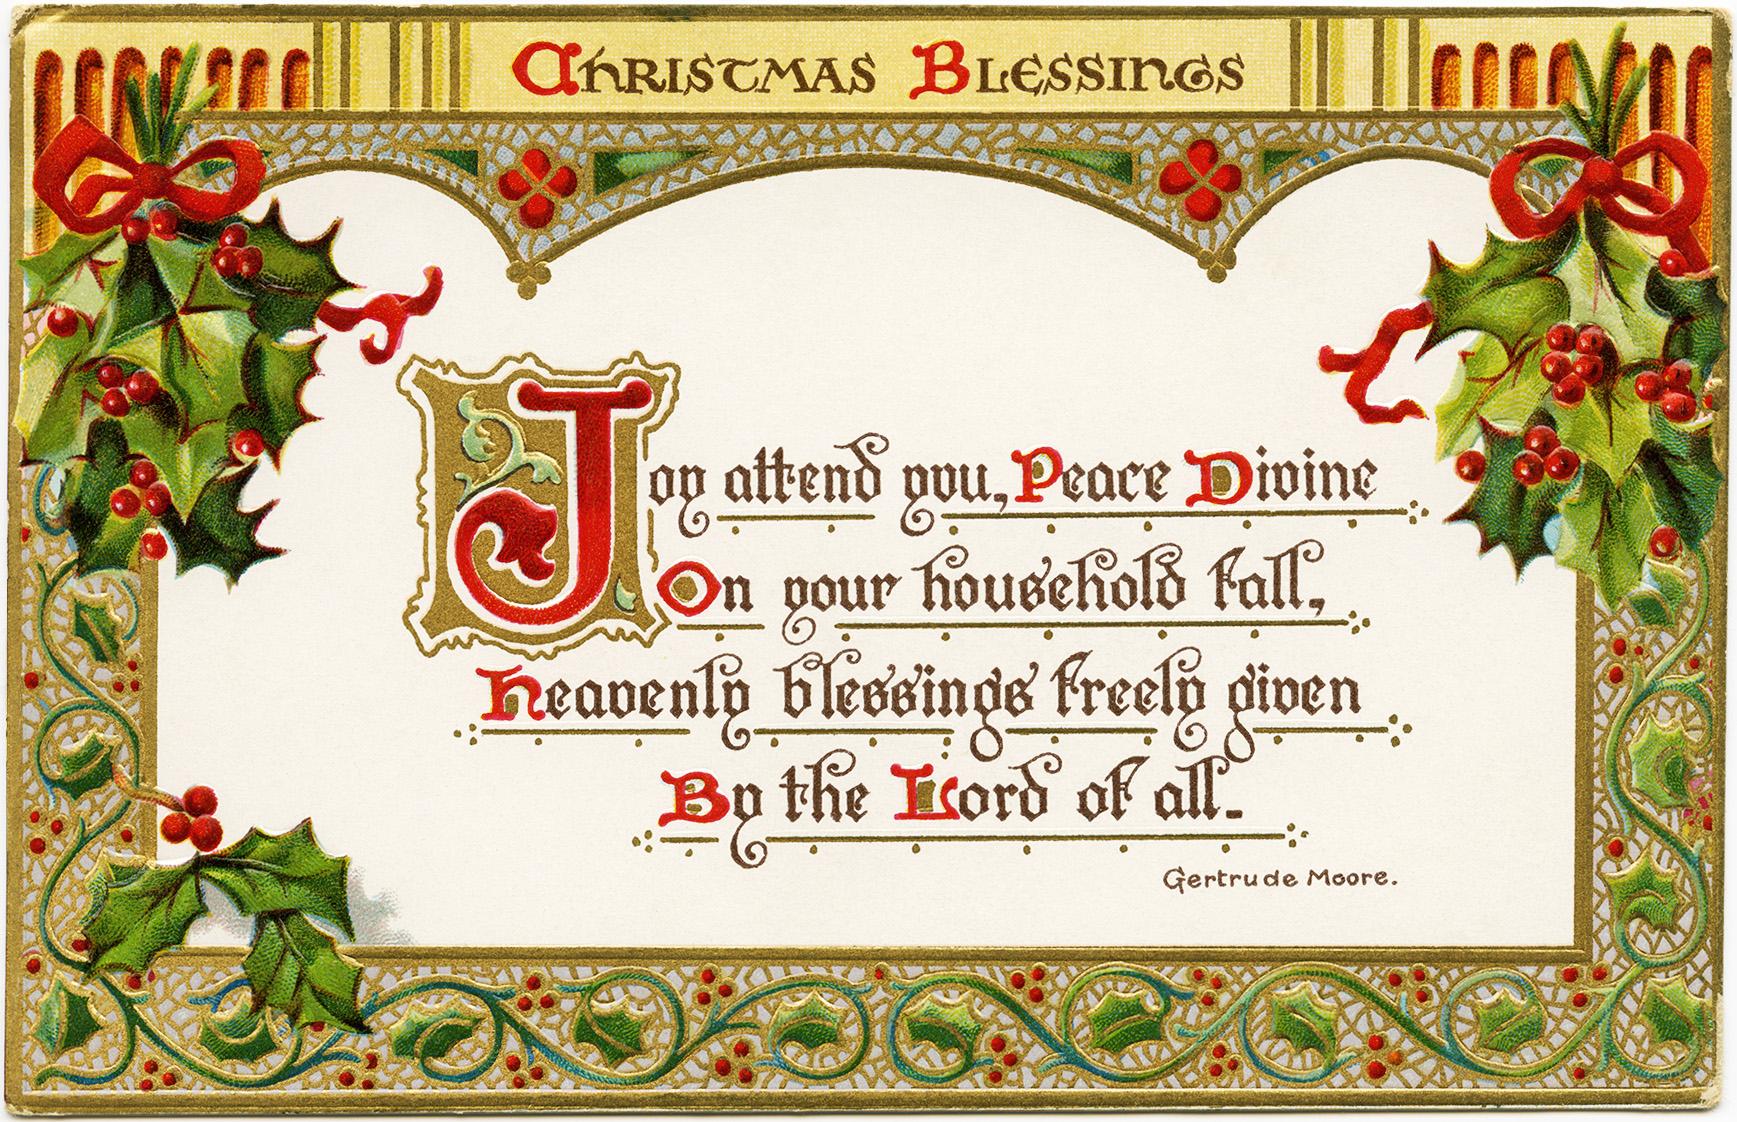 Christmas Blessings ~ Free Vintage Postcard Graphic - Old Design - Free Printable Vintage Christmas Clip Art